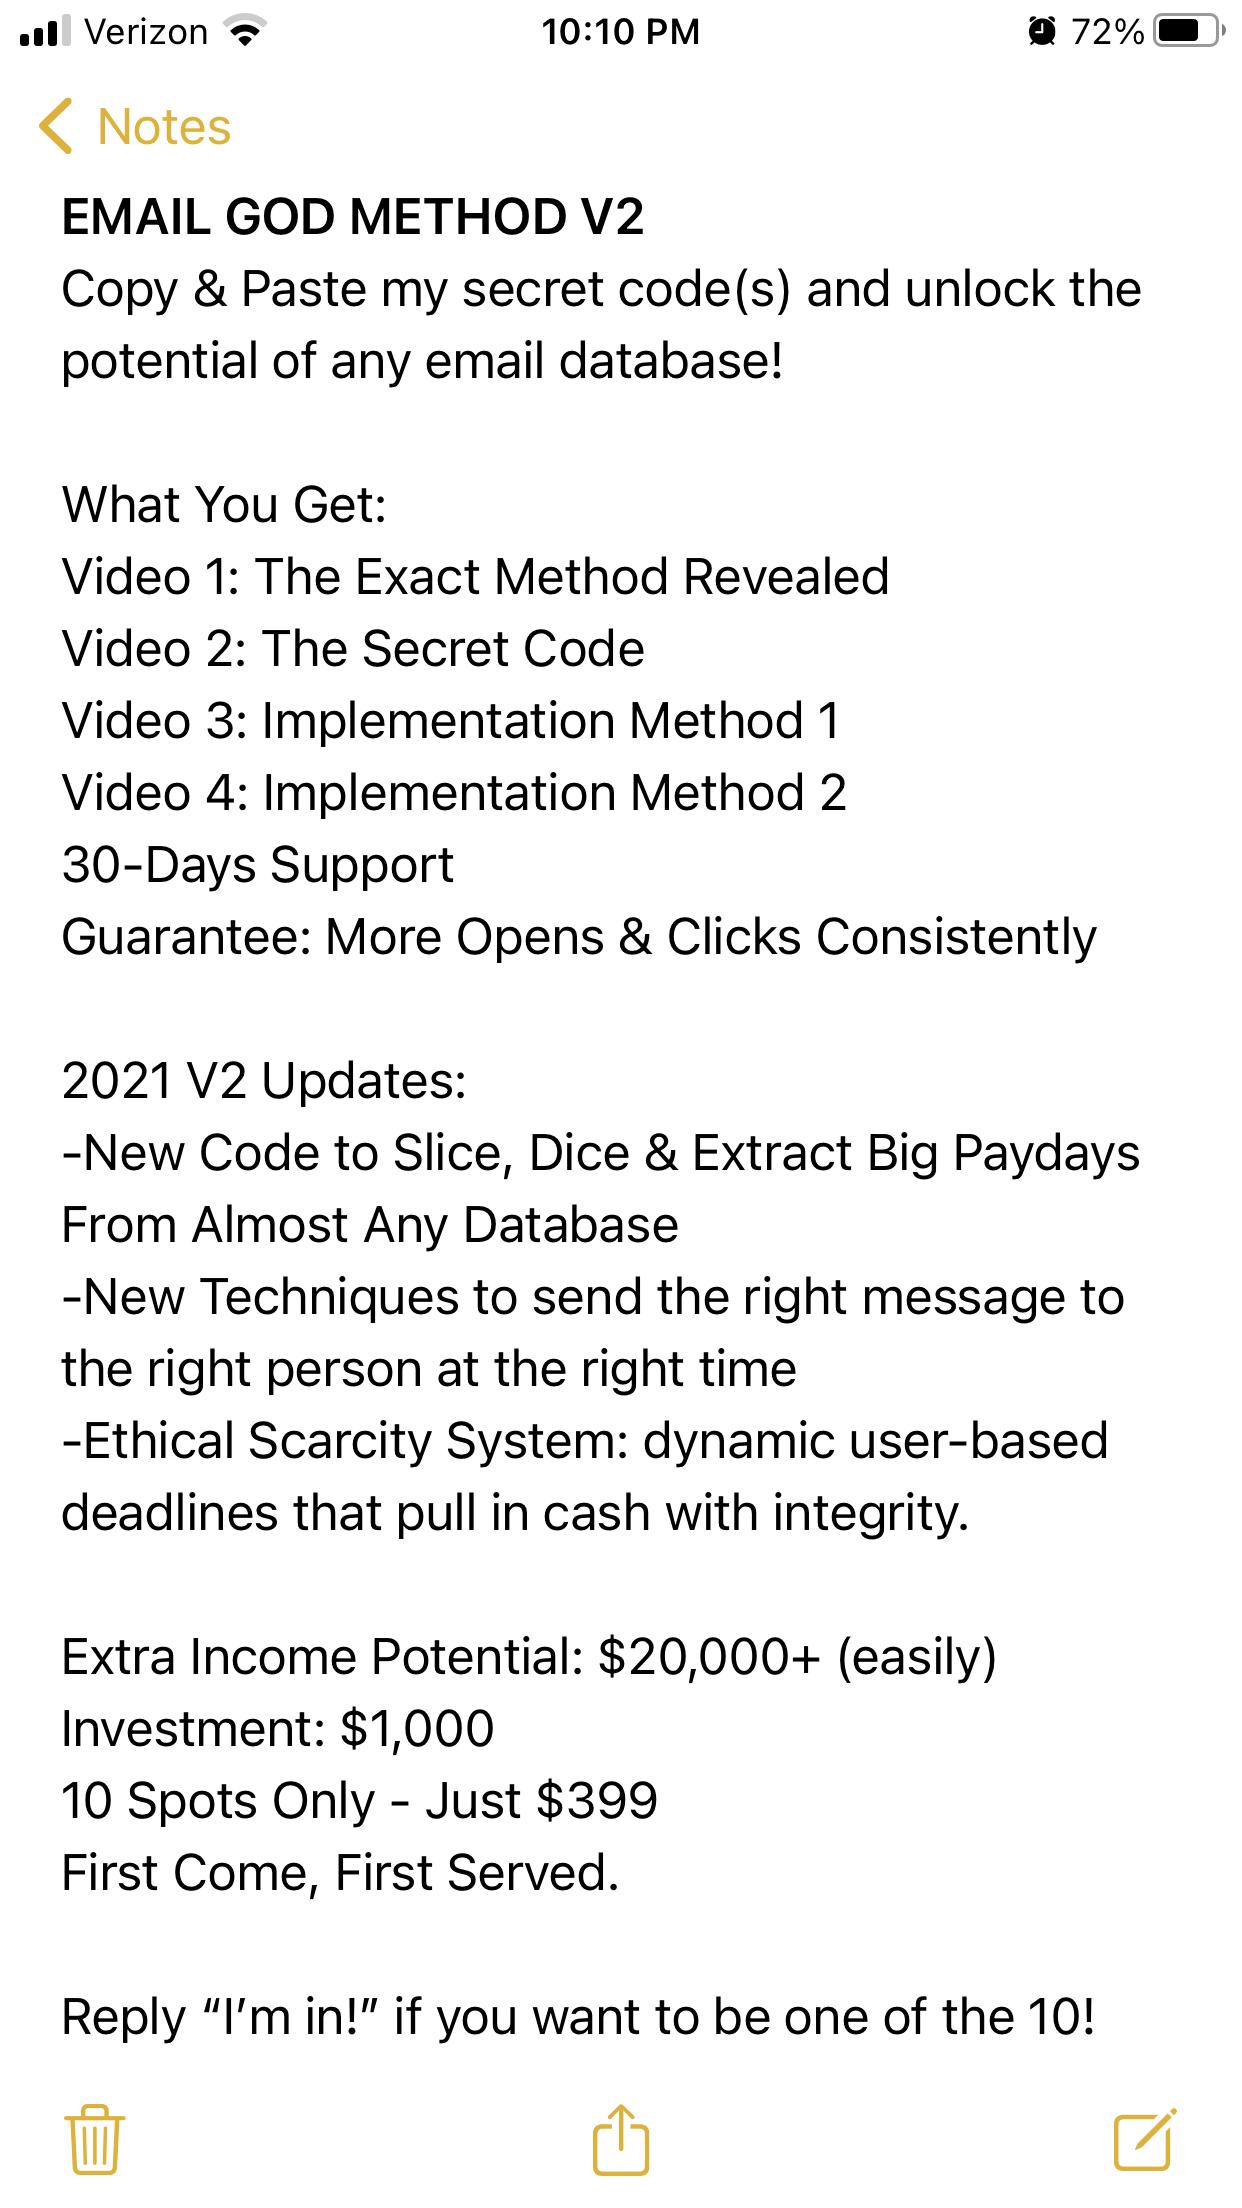 Email God System